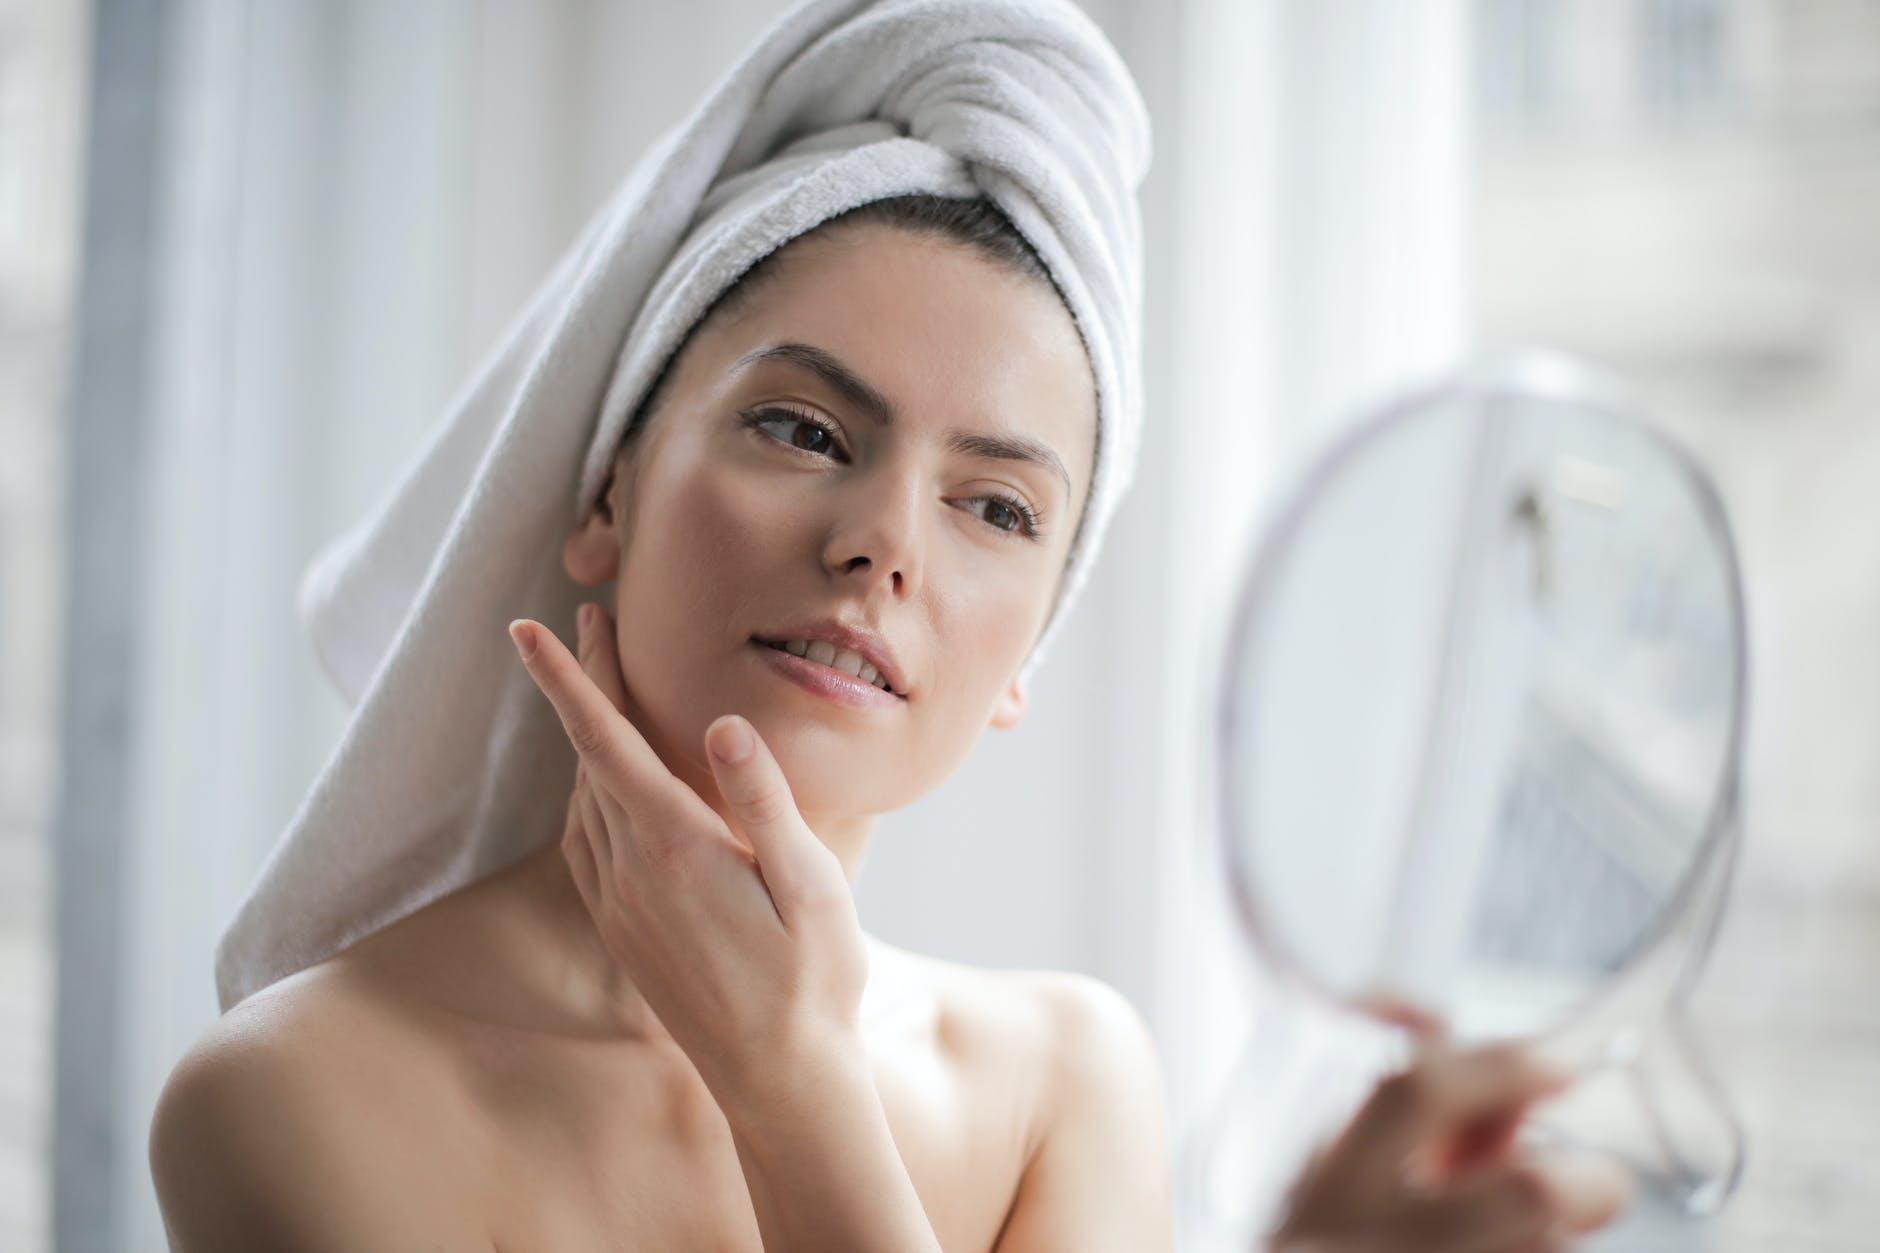 Hypnos vid hudproblem